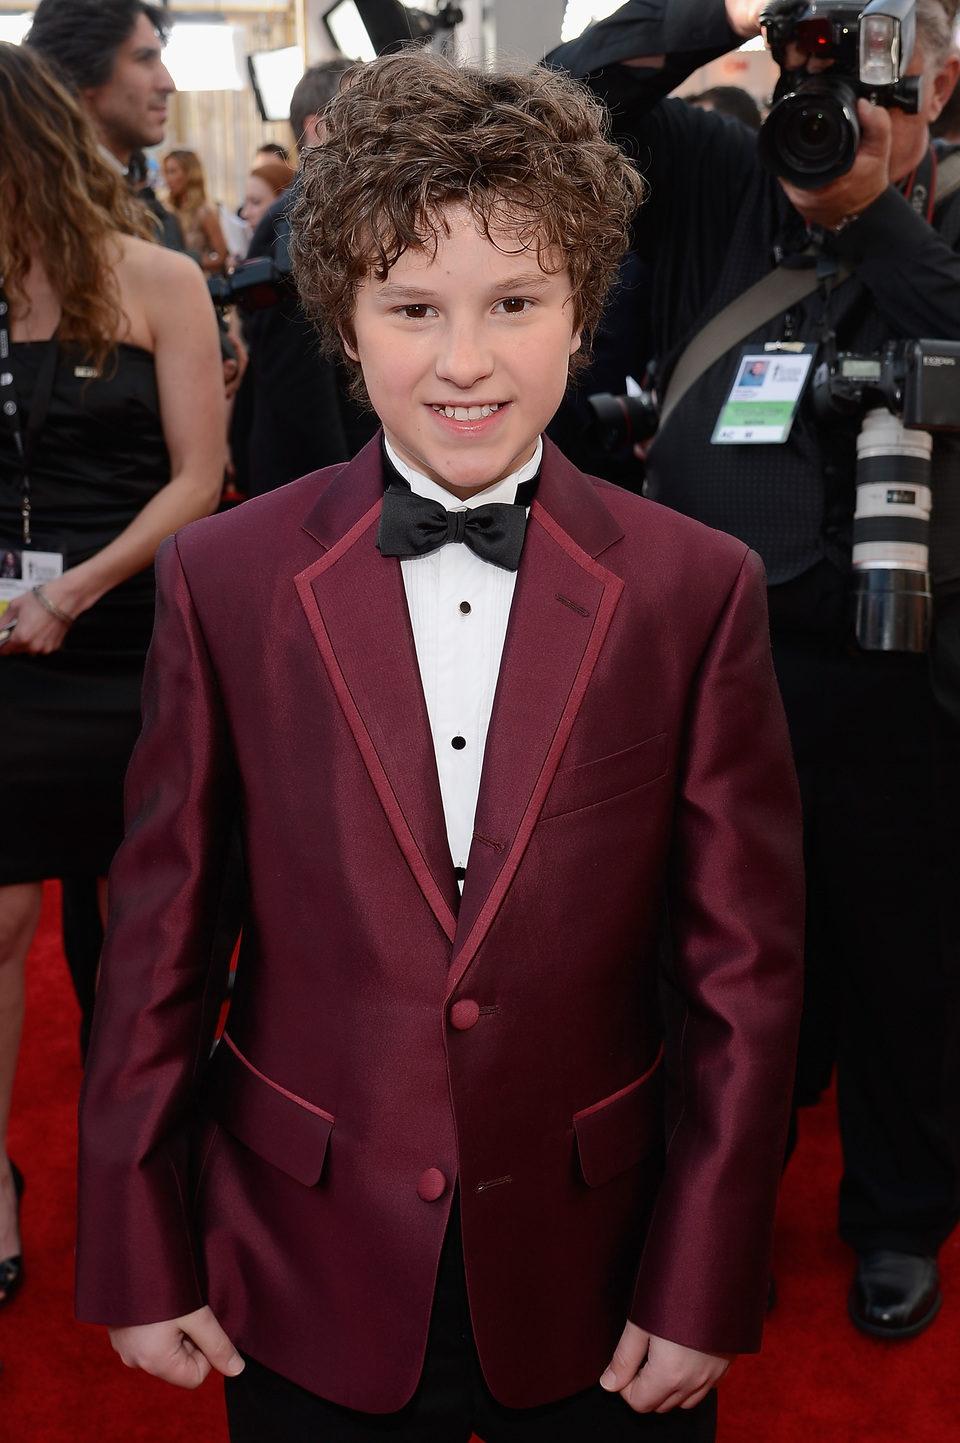 Nolan Gould en la alfombra roja de los Screen Actors Guild Awards 2013